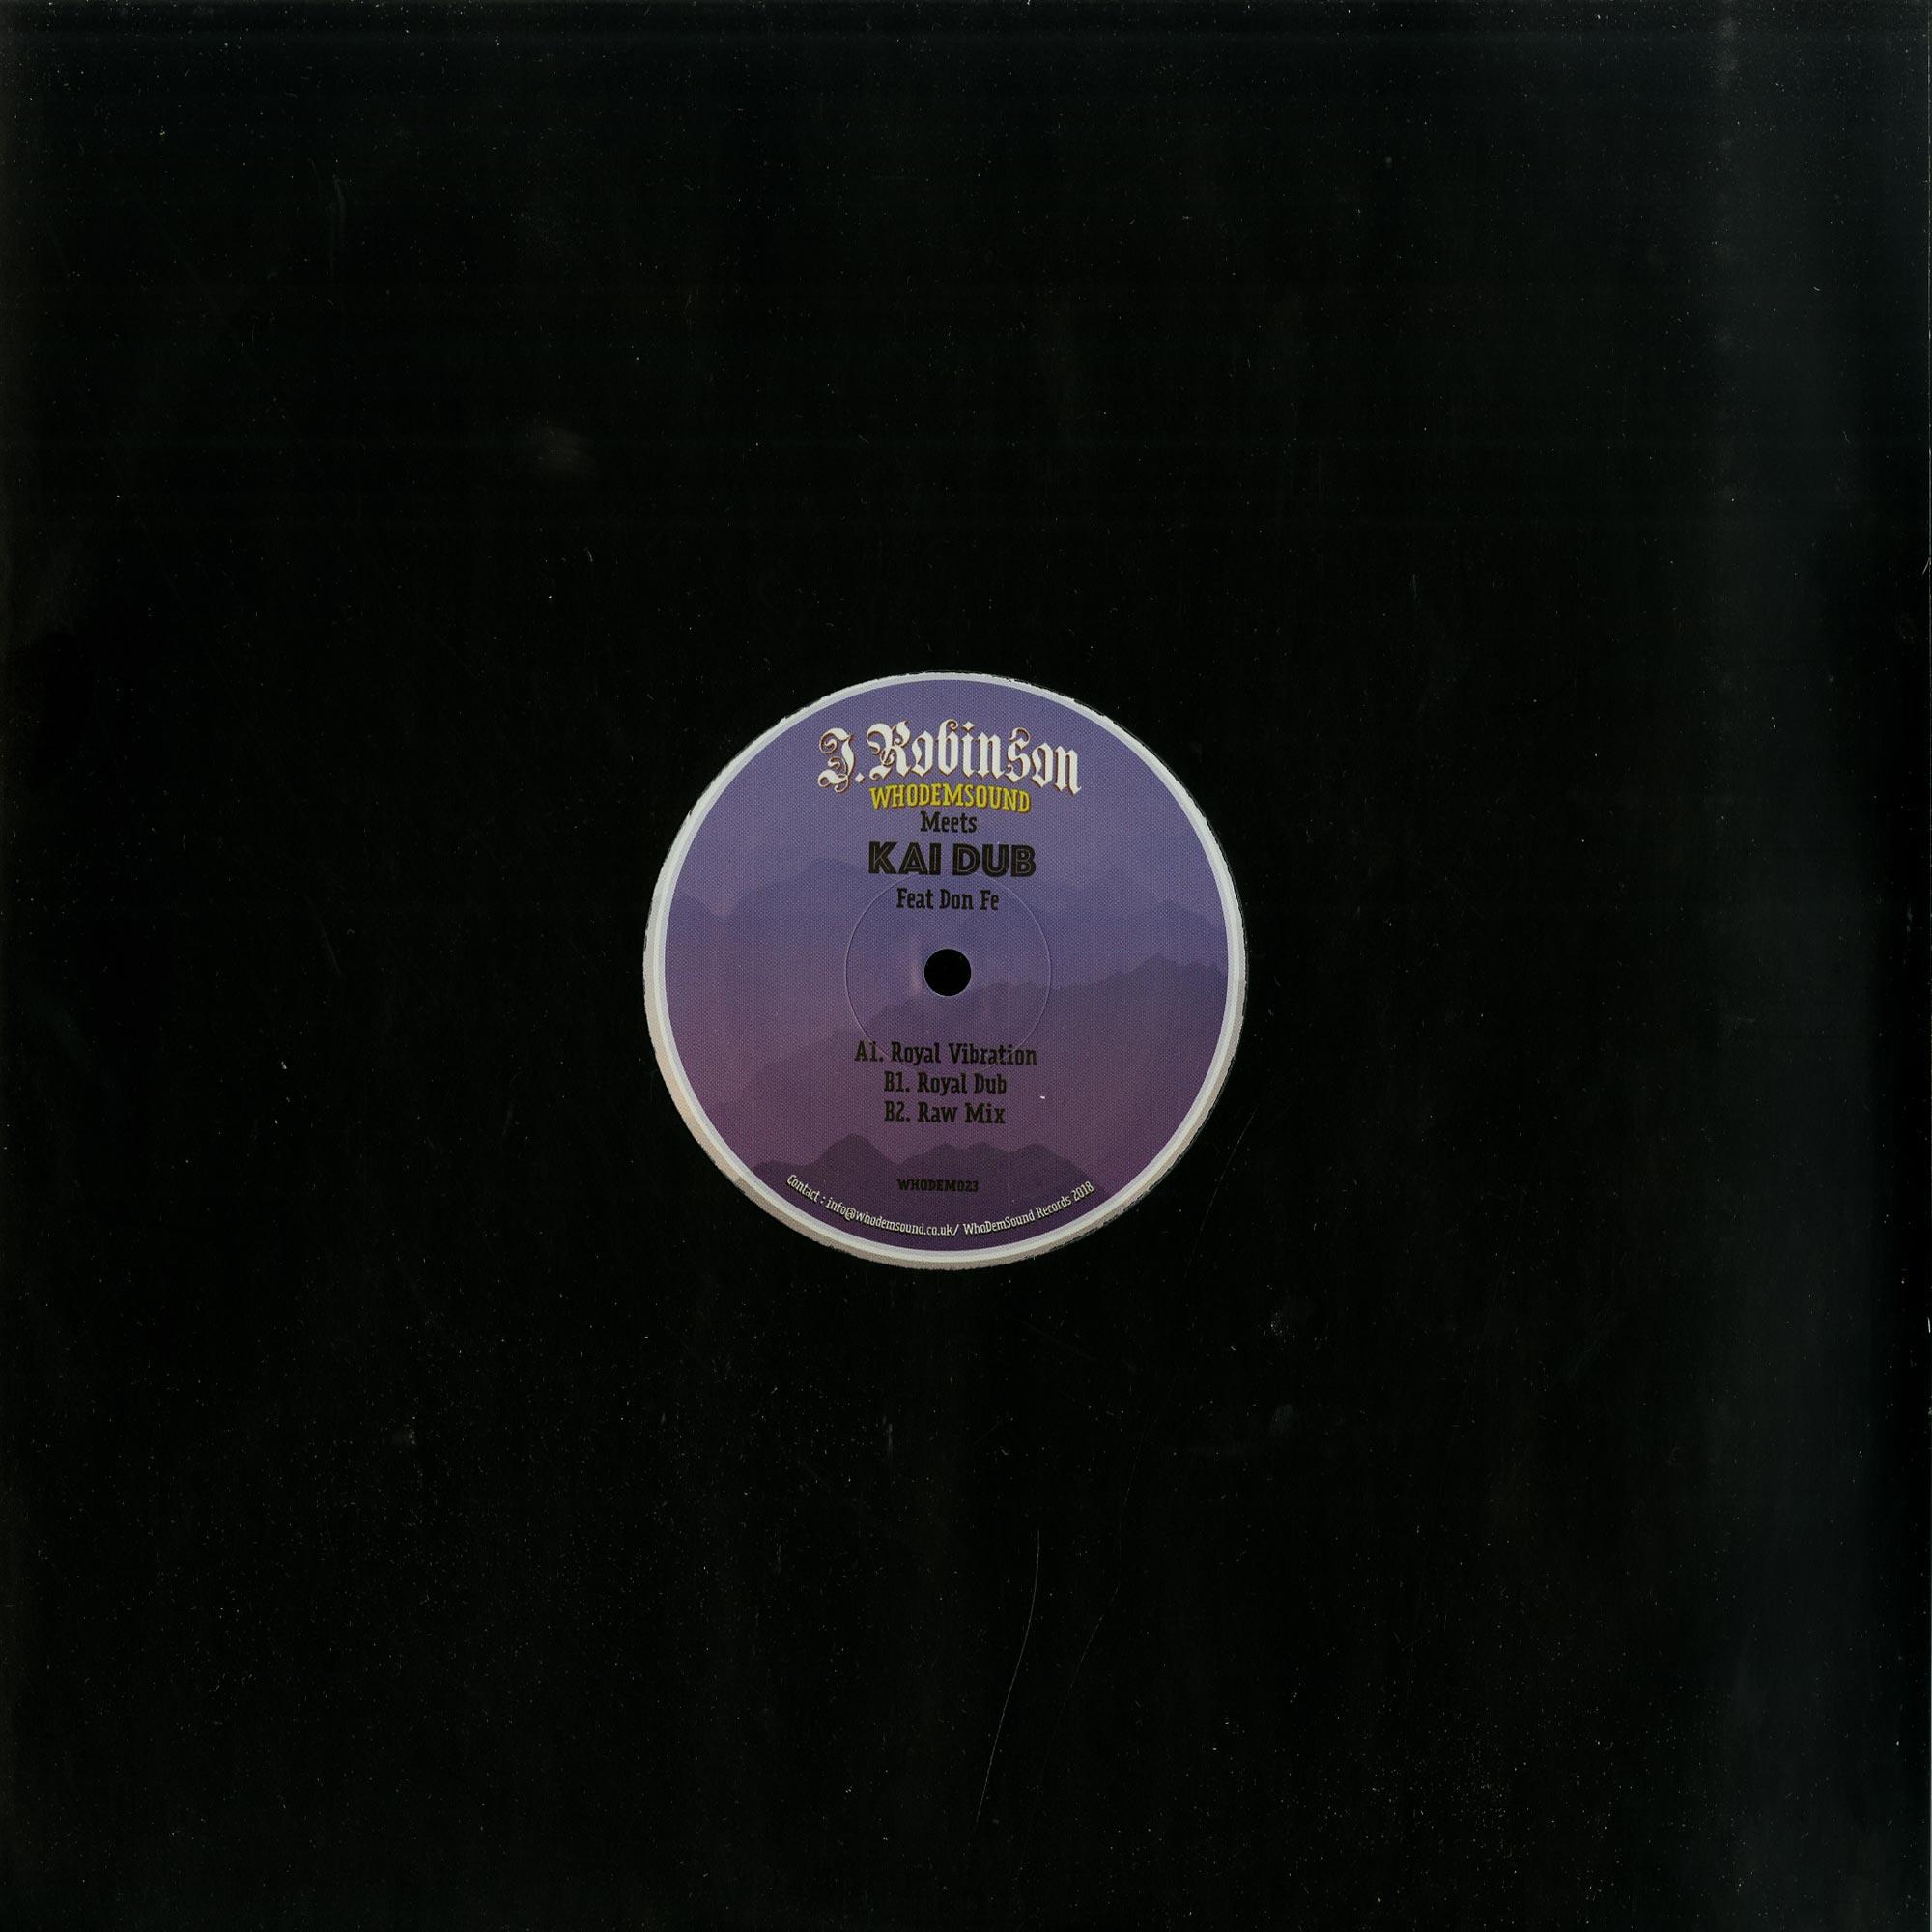 J.Robinson WhoDemSound Meets Kai Dub ft. Don Fe - ROYAL VIBRATION